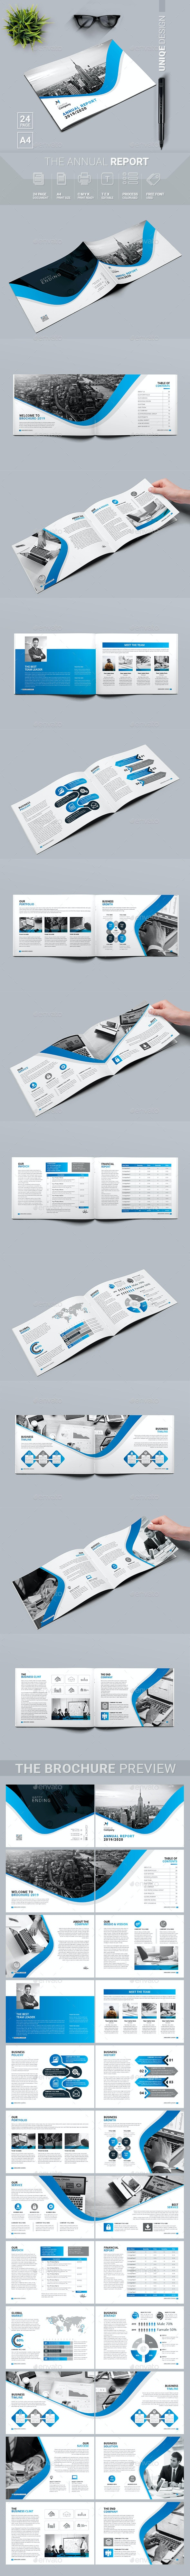 Landscape Annual Report - Magazines Print Templates